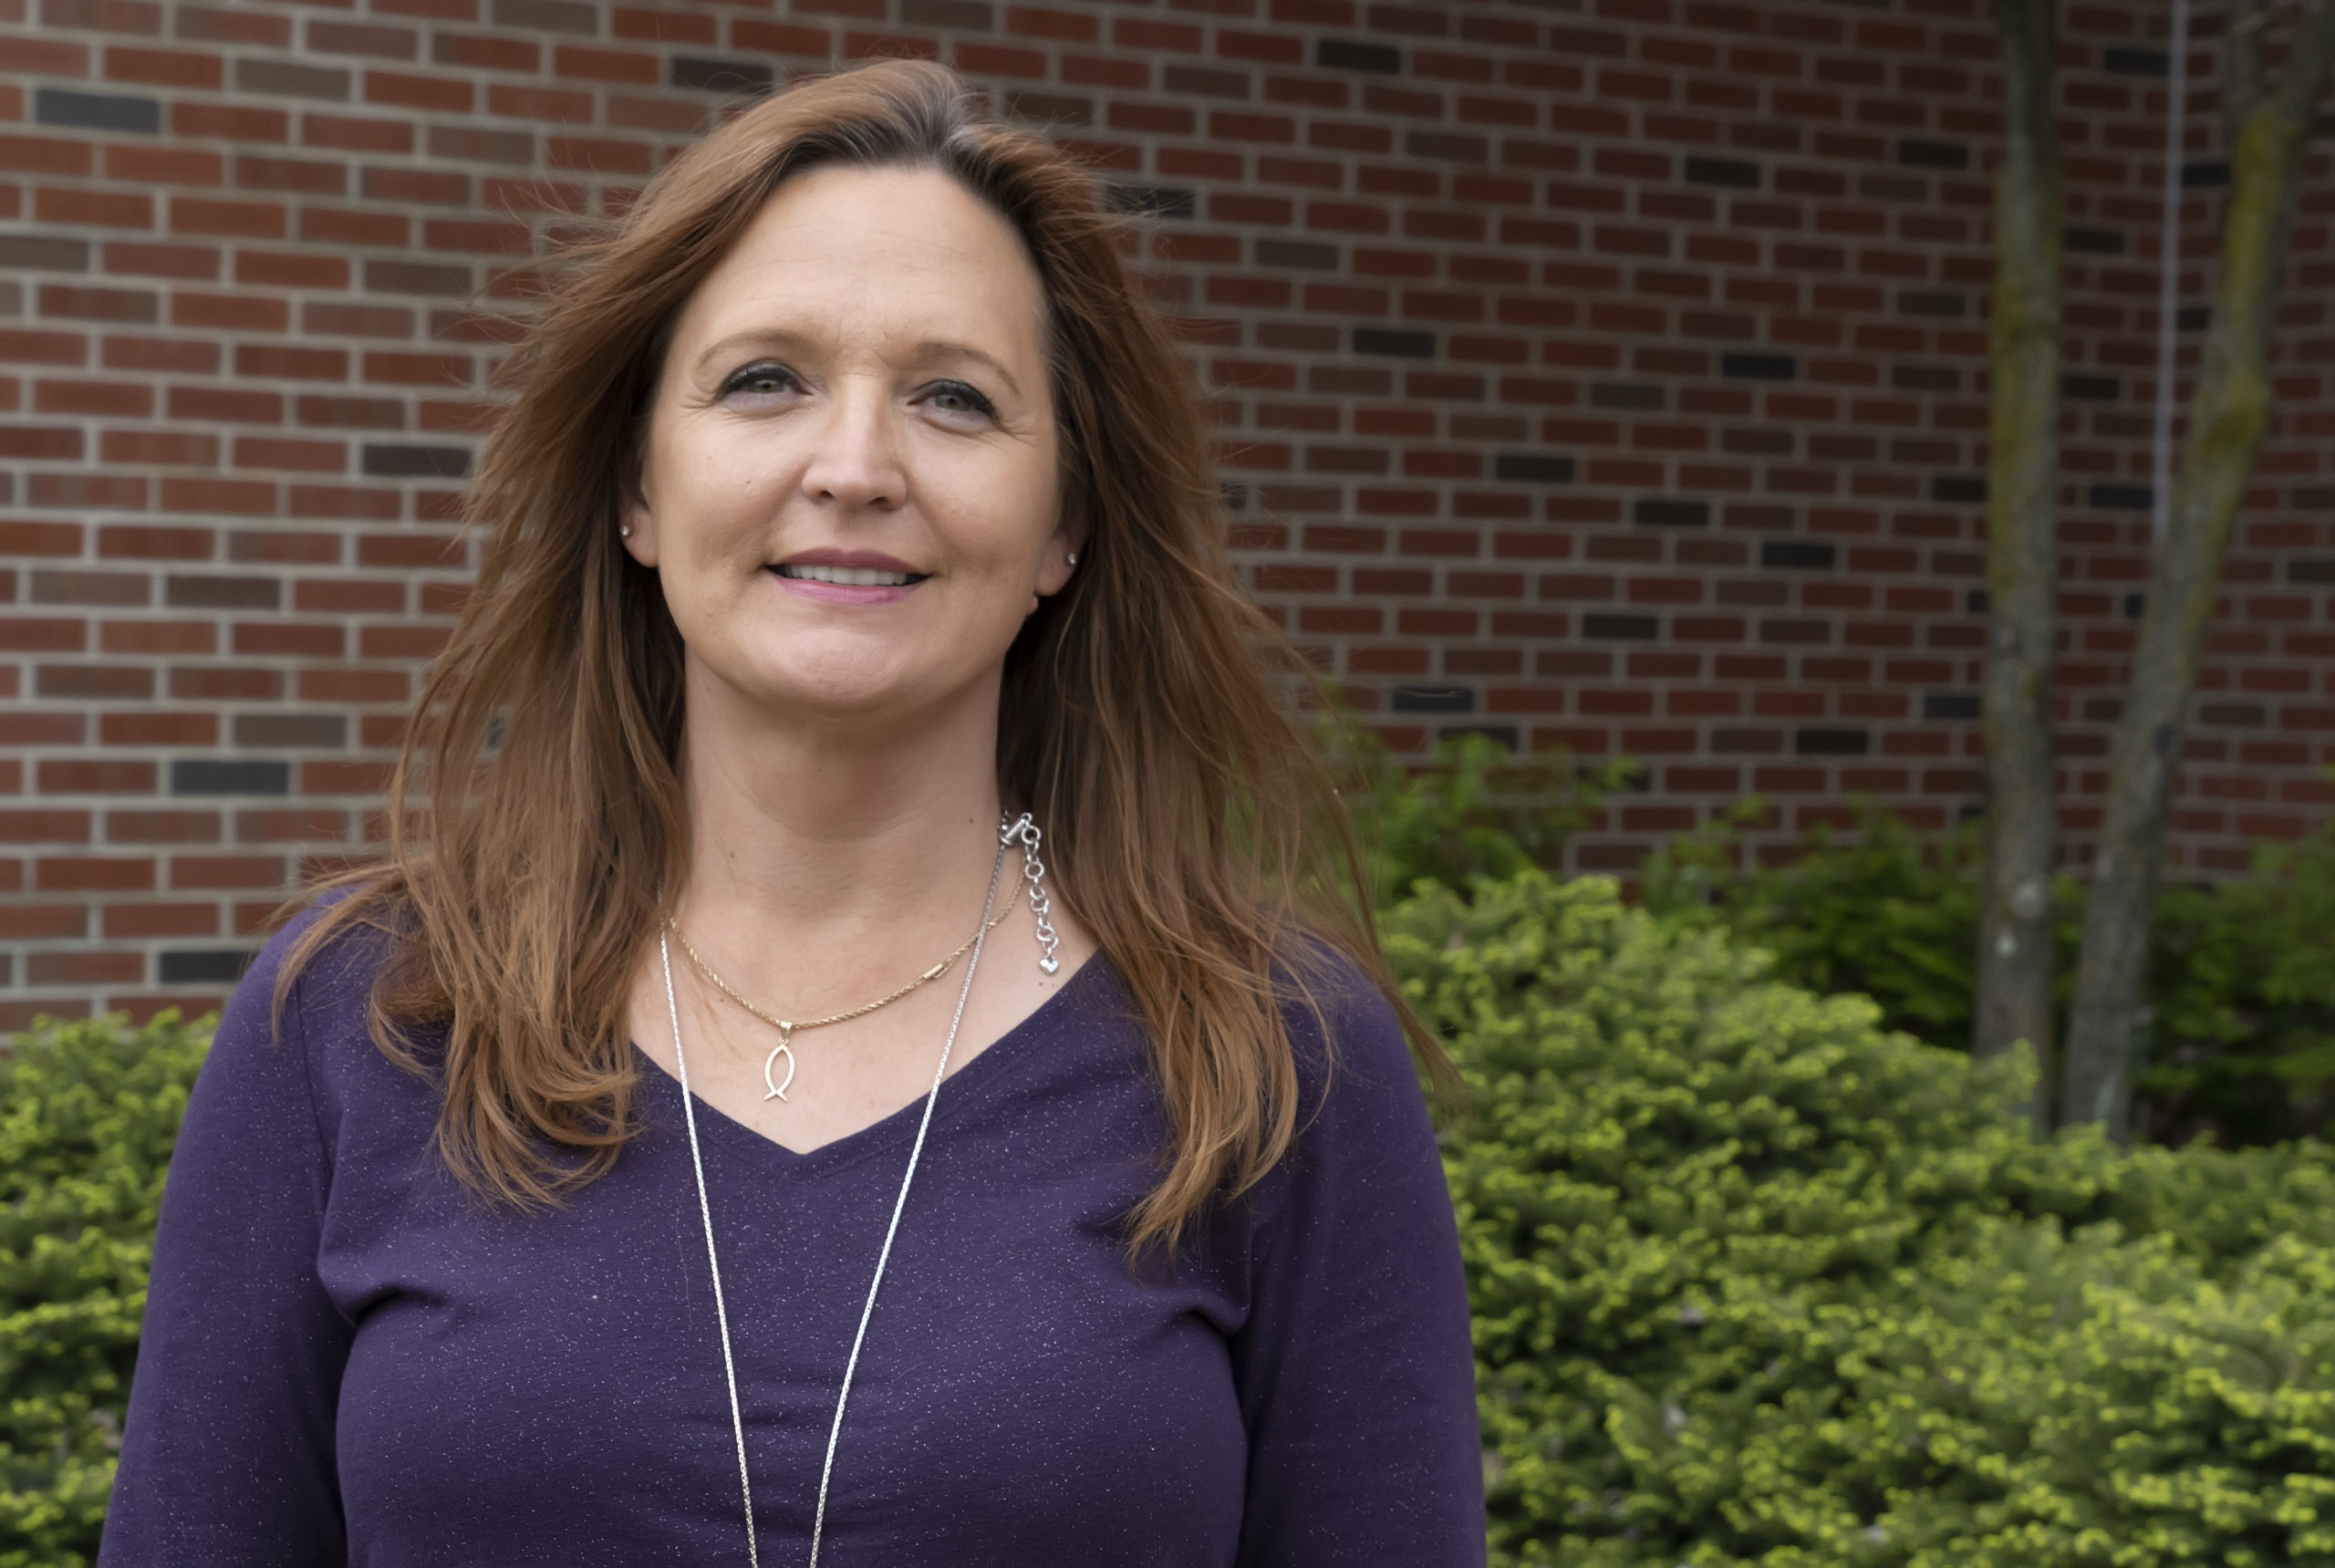 Carolyn Loew RN, BSN